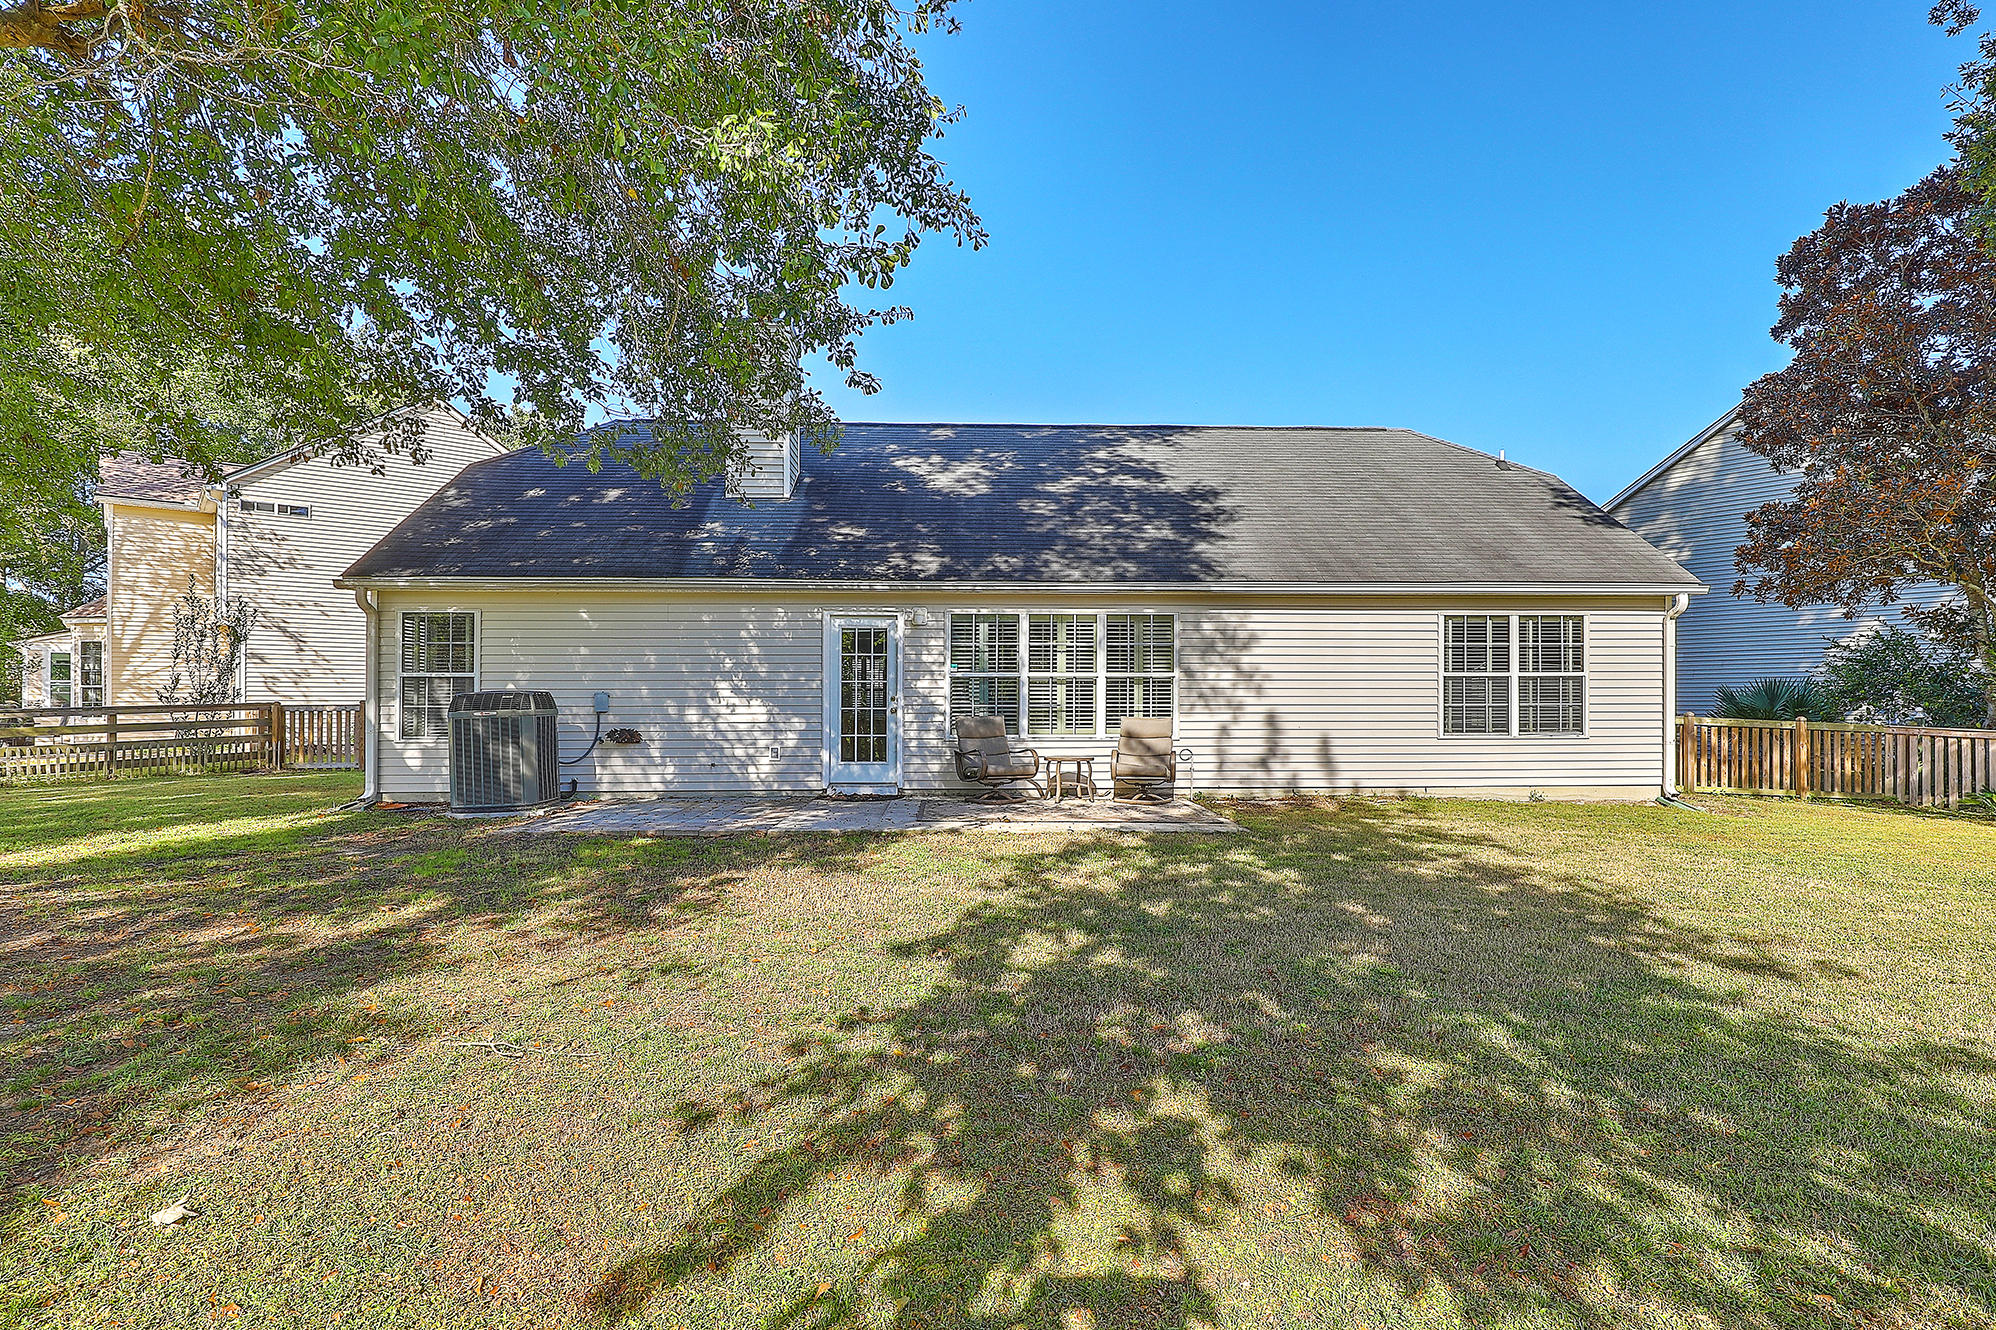 Planters Pointe Homes For Sale - 2740 Four Winds, Mount Pleasant, SC - 24